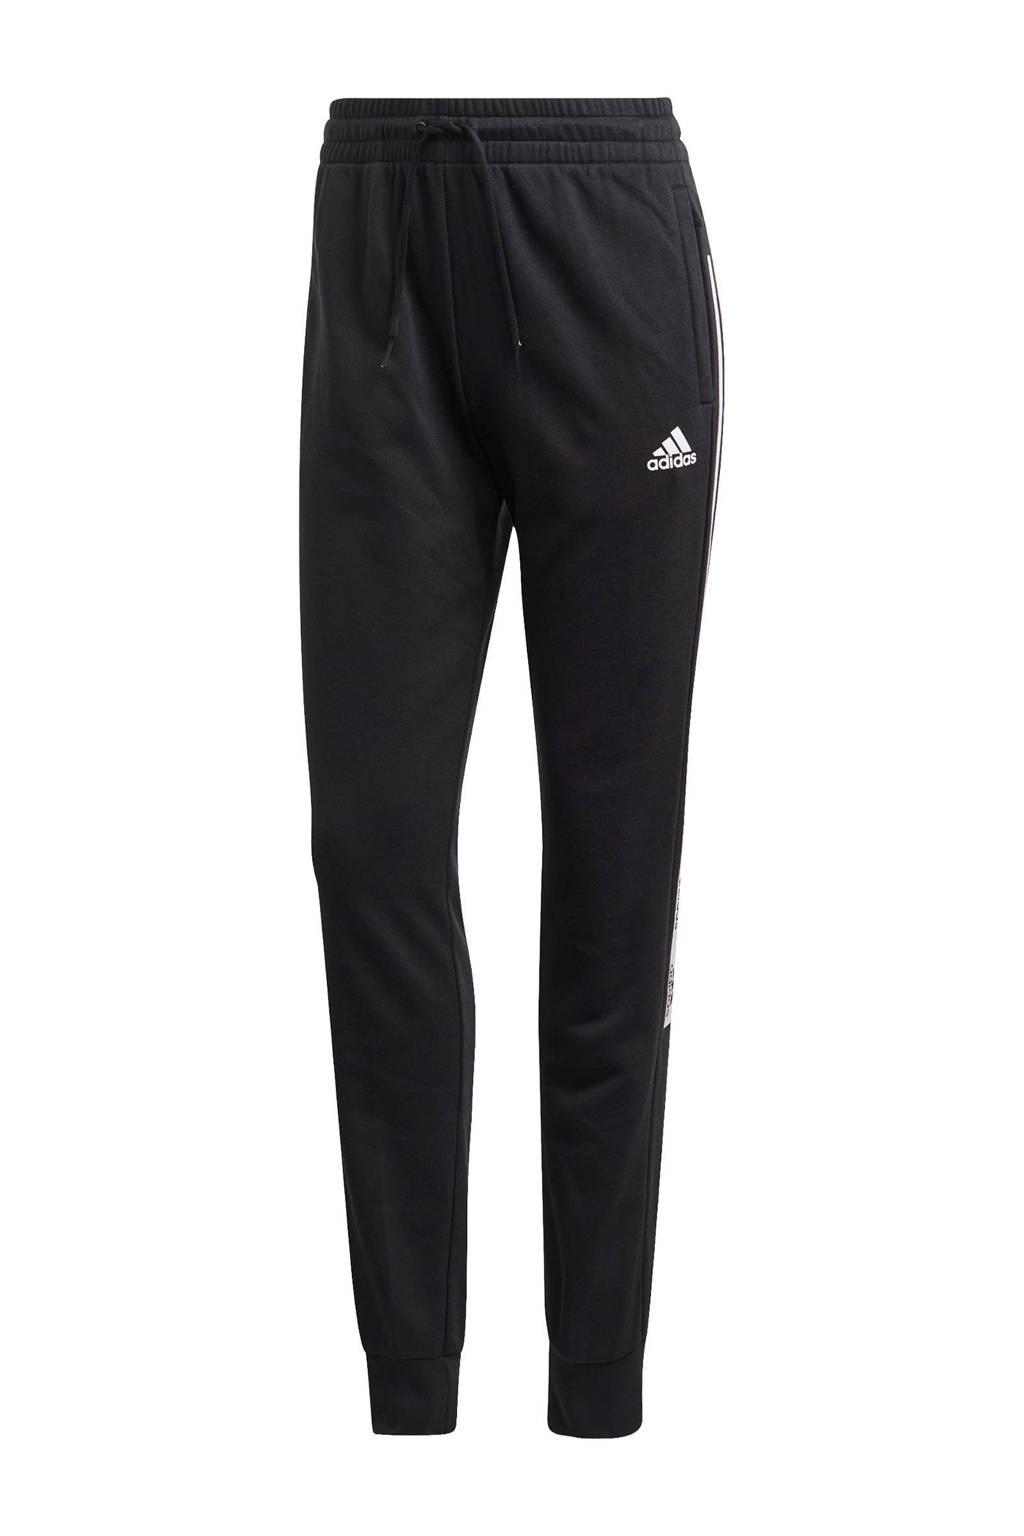 adidas Performance joggingbroek zwart, Zwart